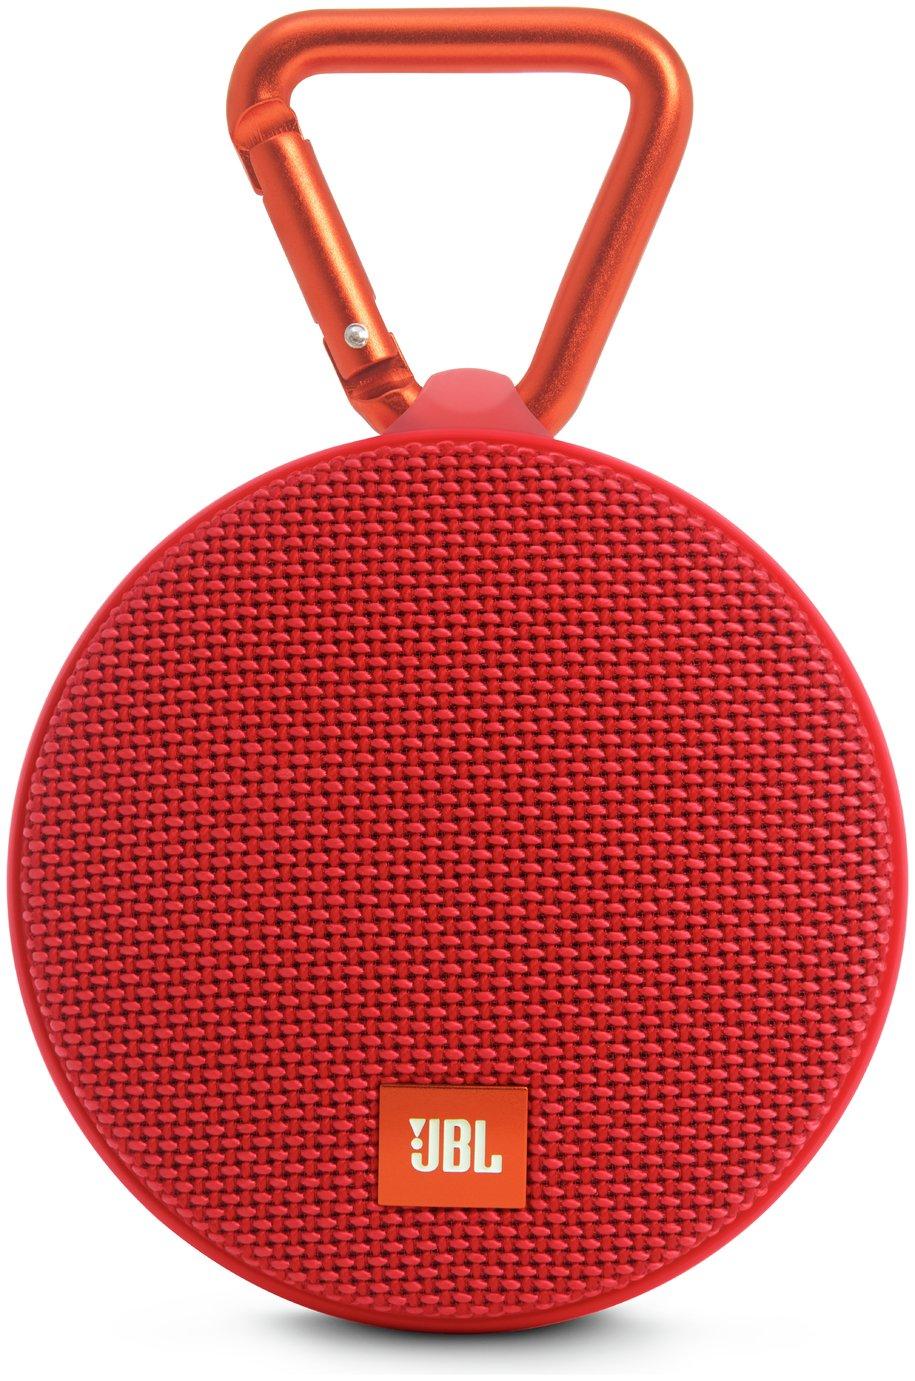 JBL Clip 2  Portable Wireless Speaker - Red